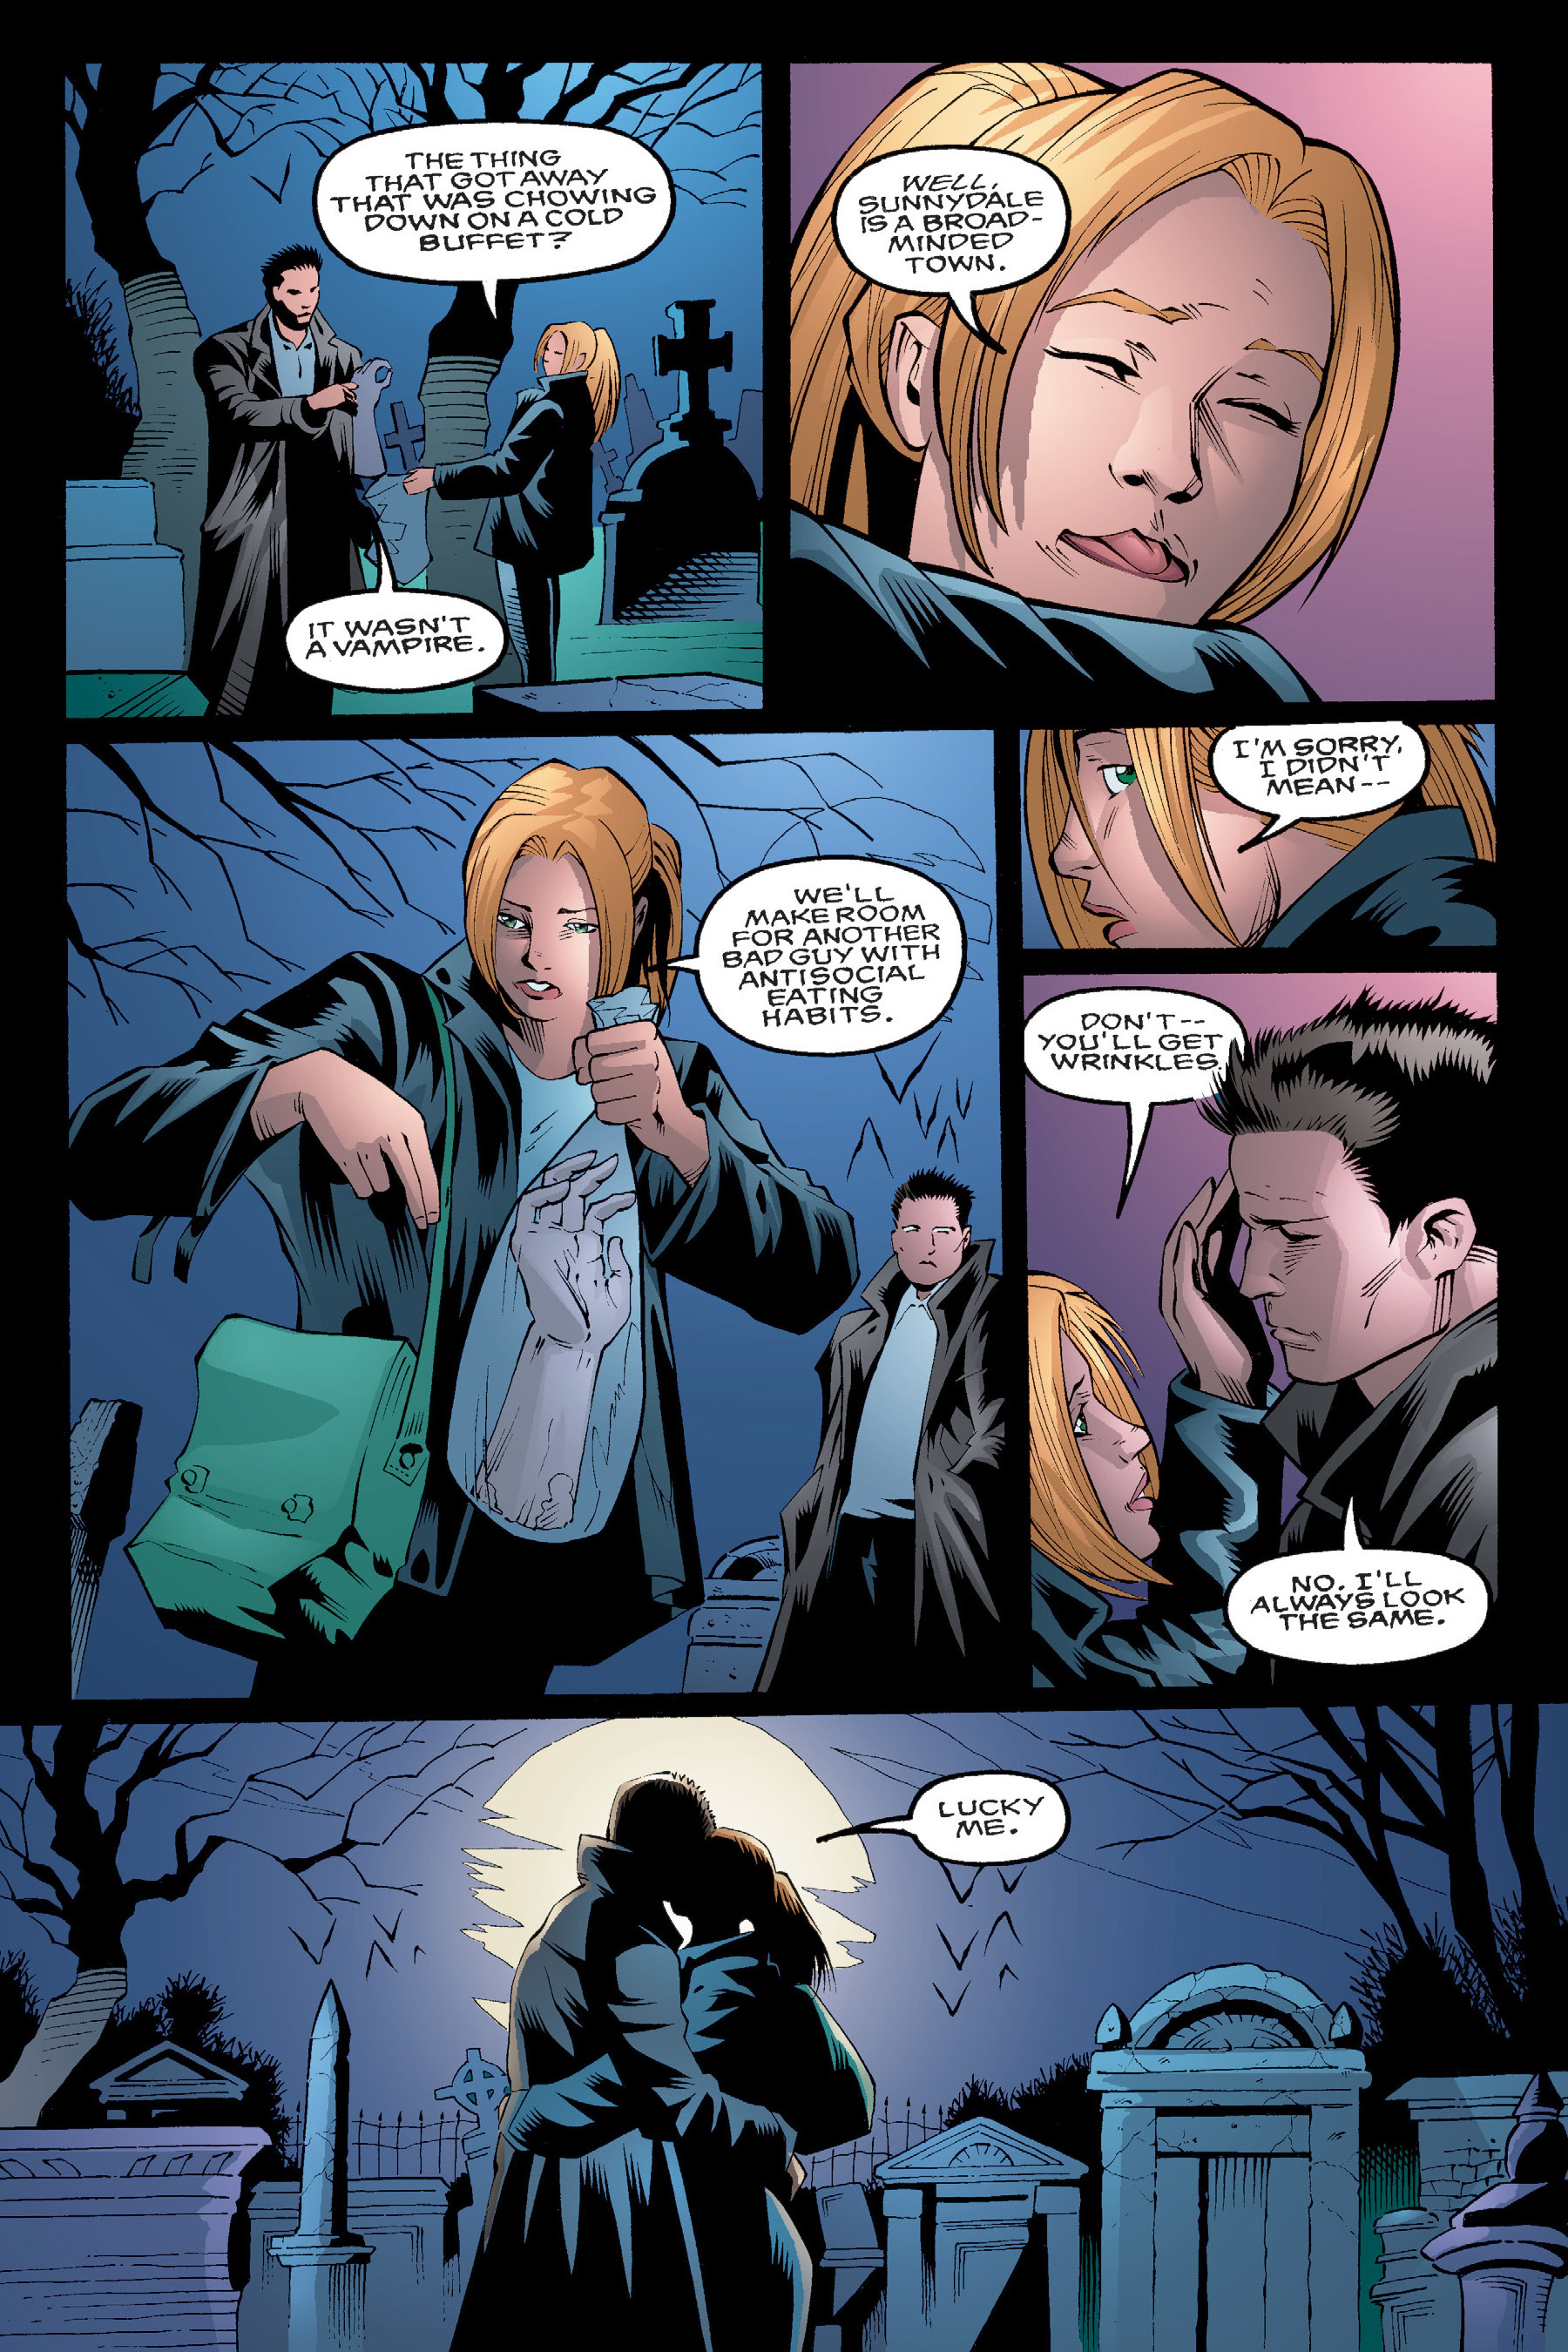 Read online Buffy the Vampire Slayer: Omnibus comic -  Issue # TPB 4 - 13